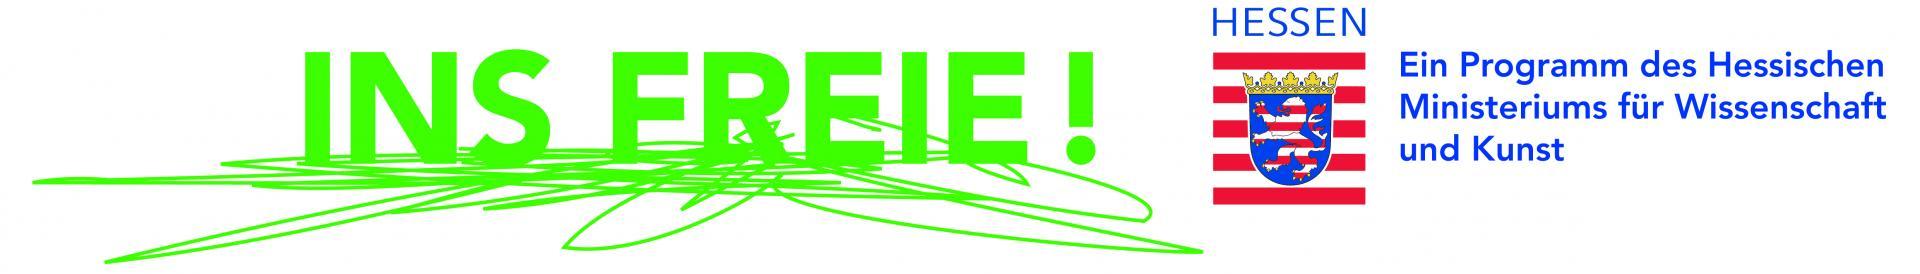 Logo INS FREIE